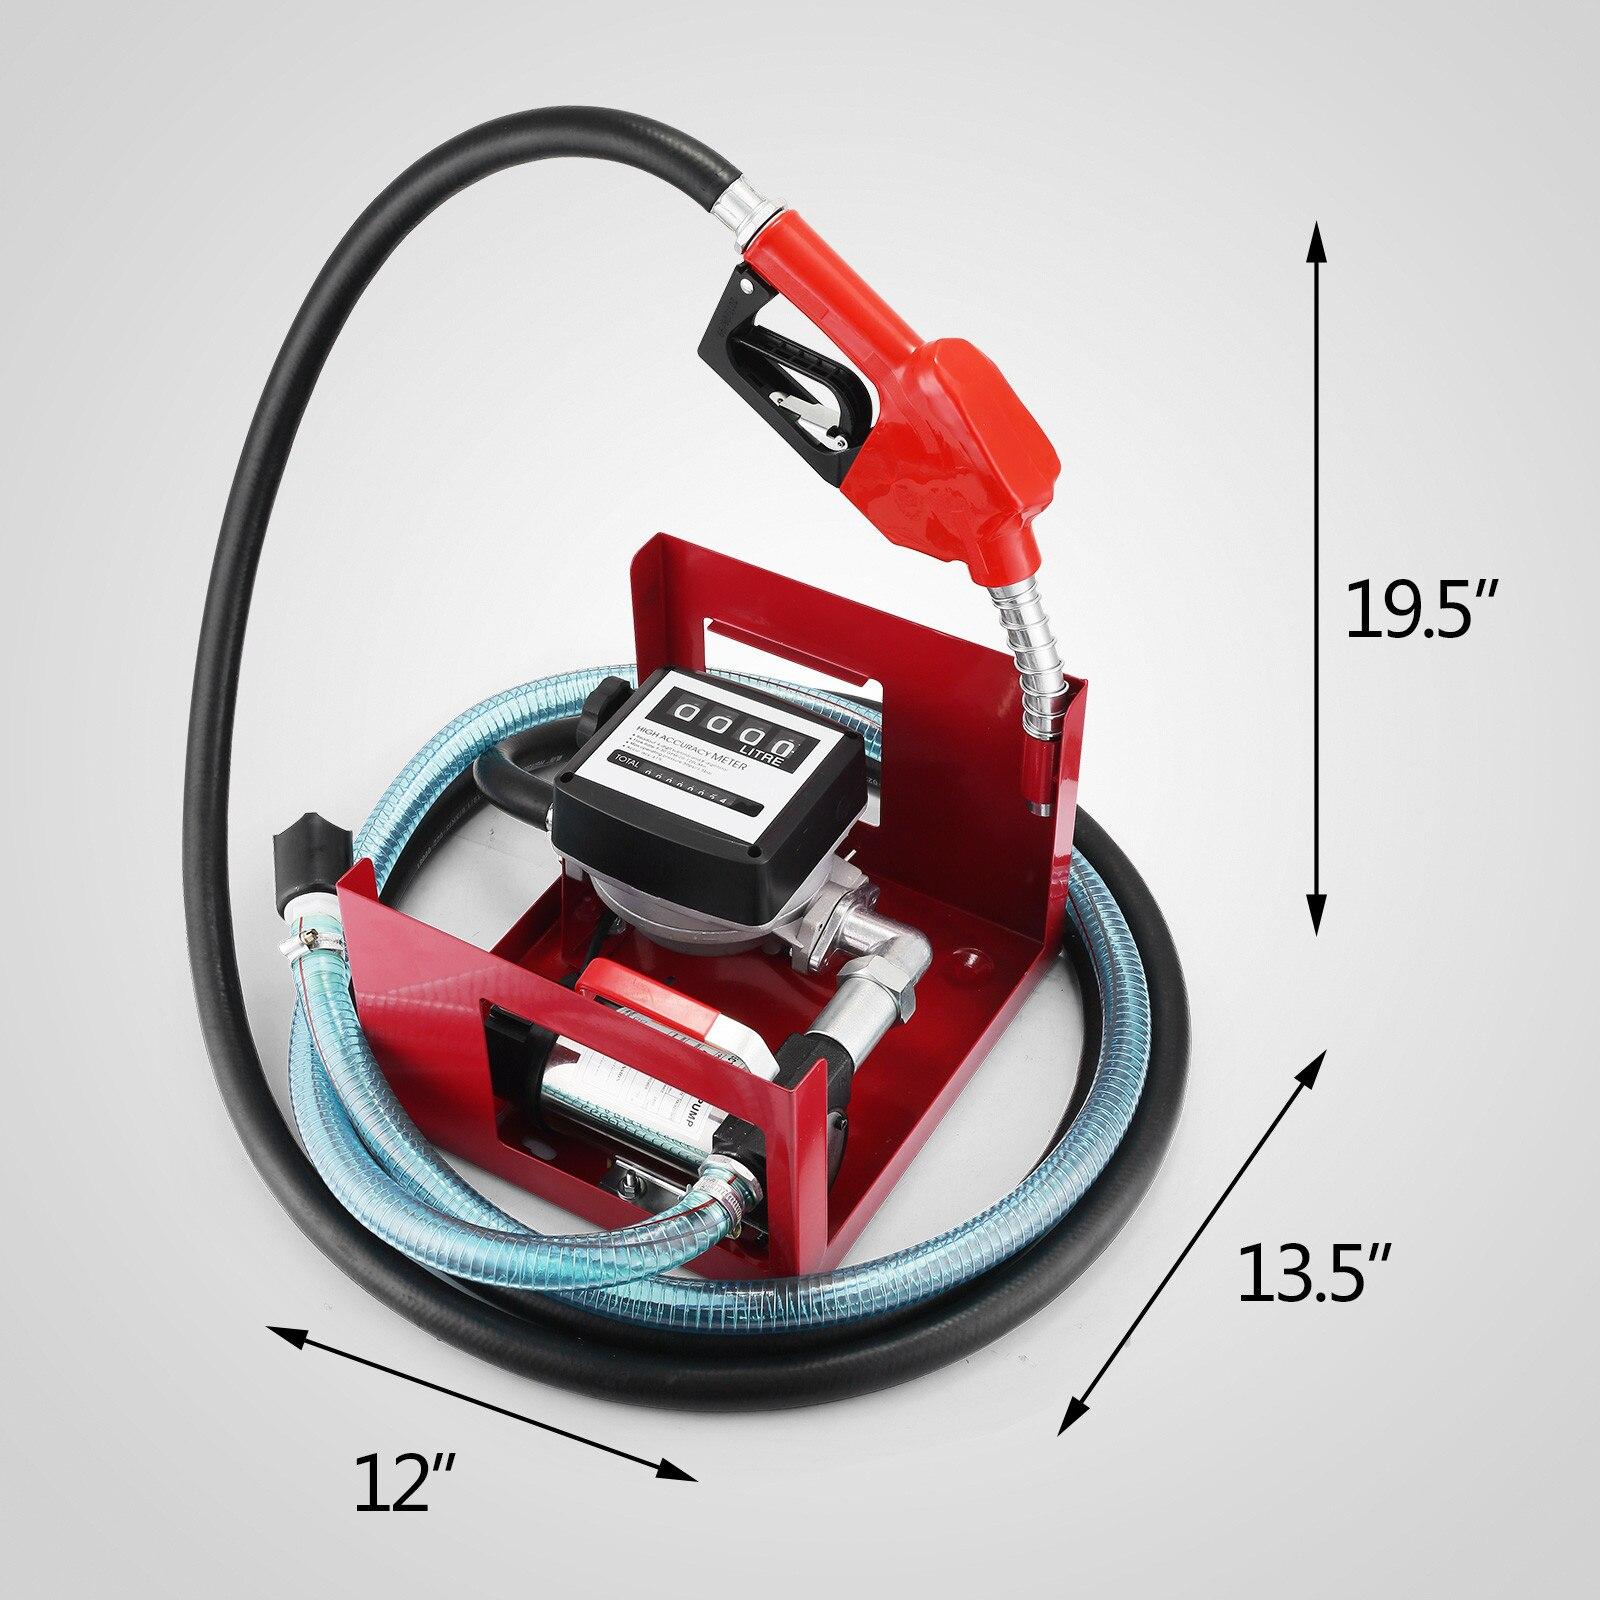 H/D Self Priming Electric Oil Pump Transfer Bio Fuel Oil Diesel 230v 40L/Min New - 2